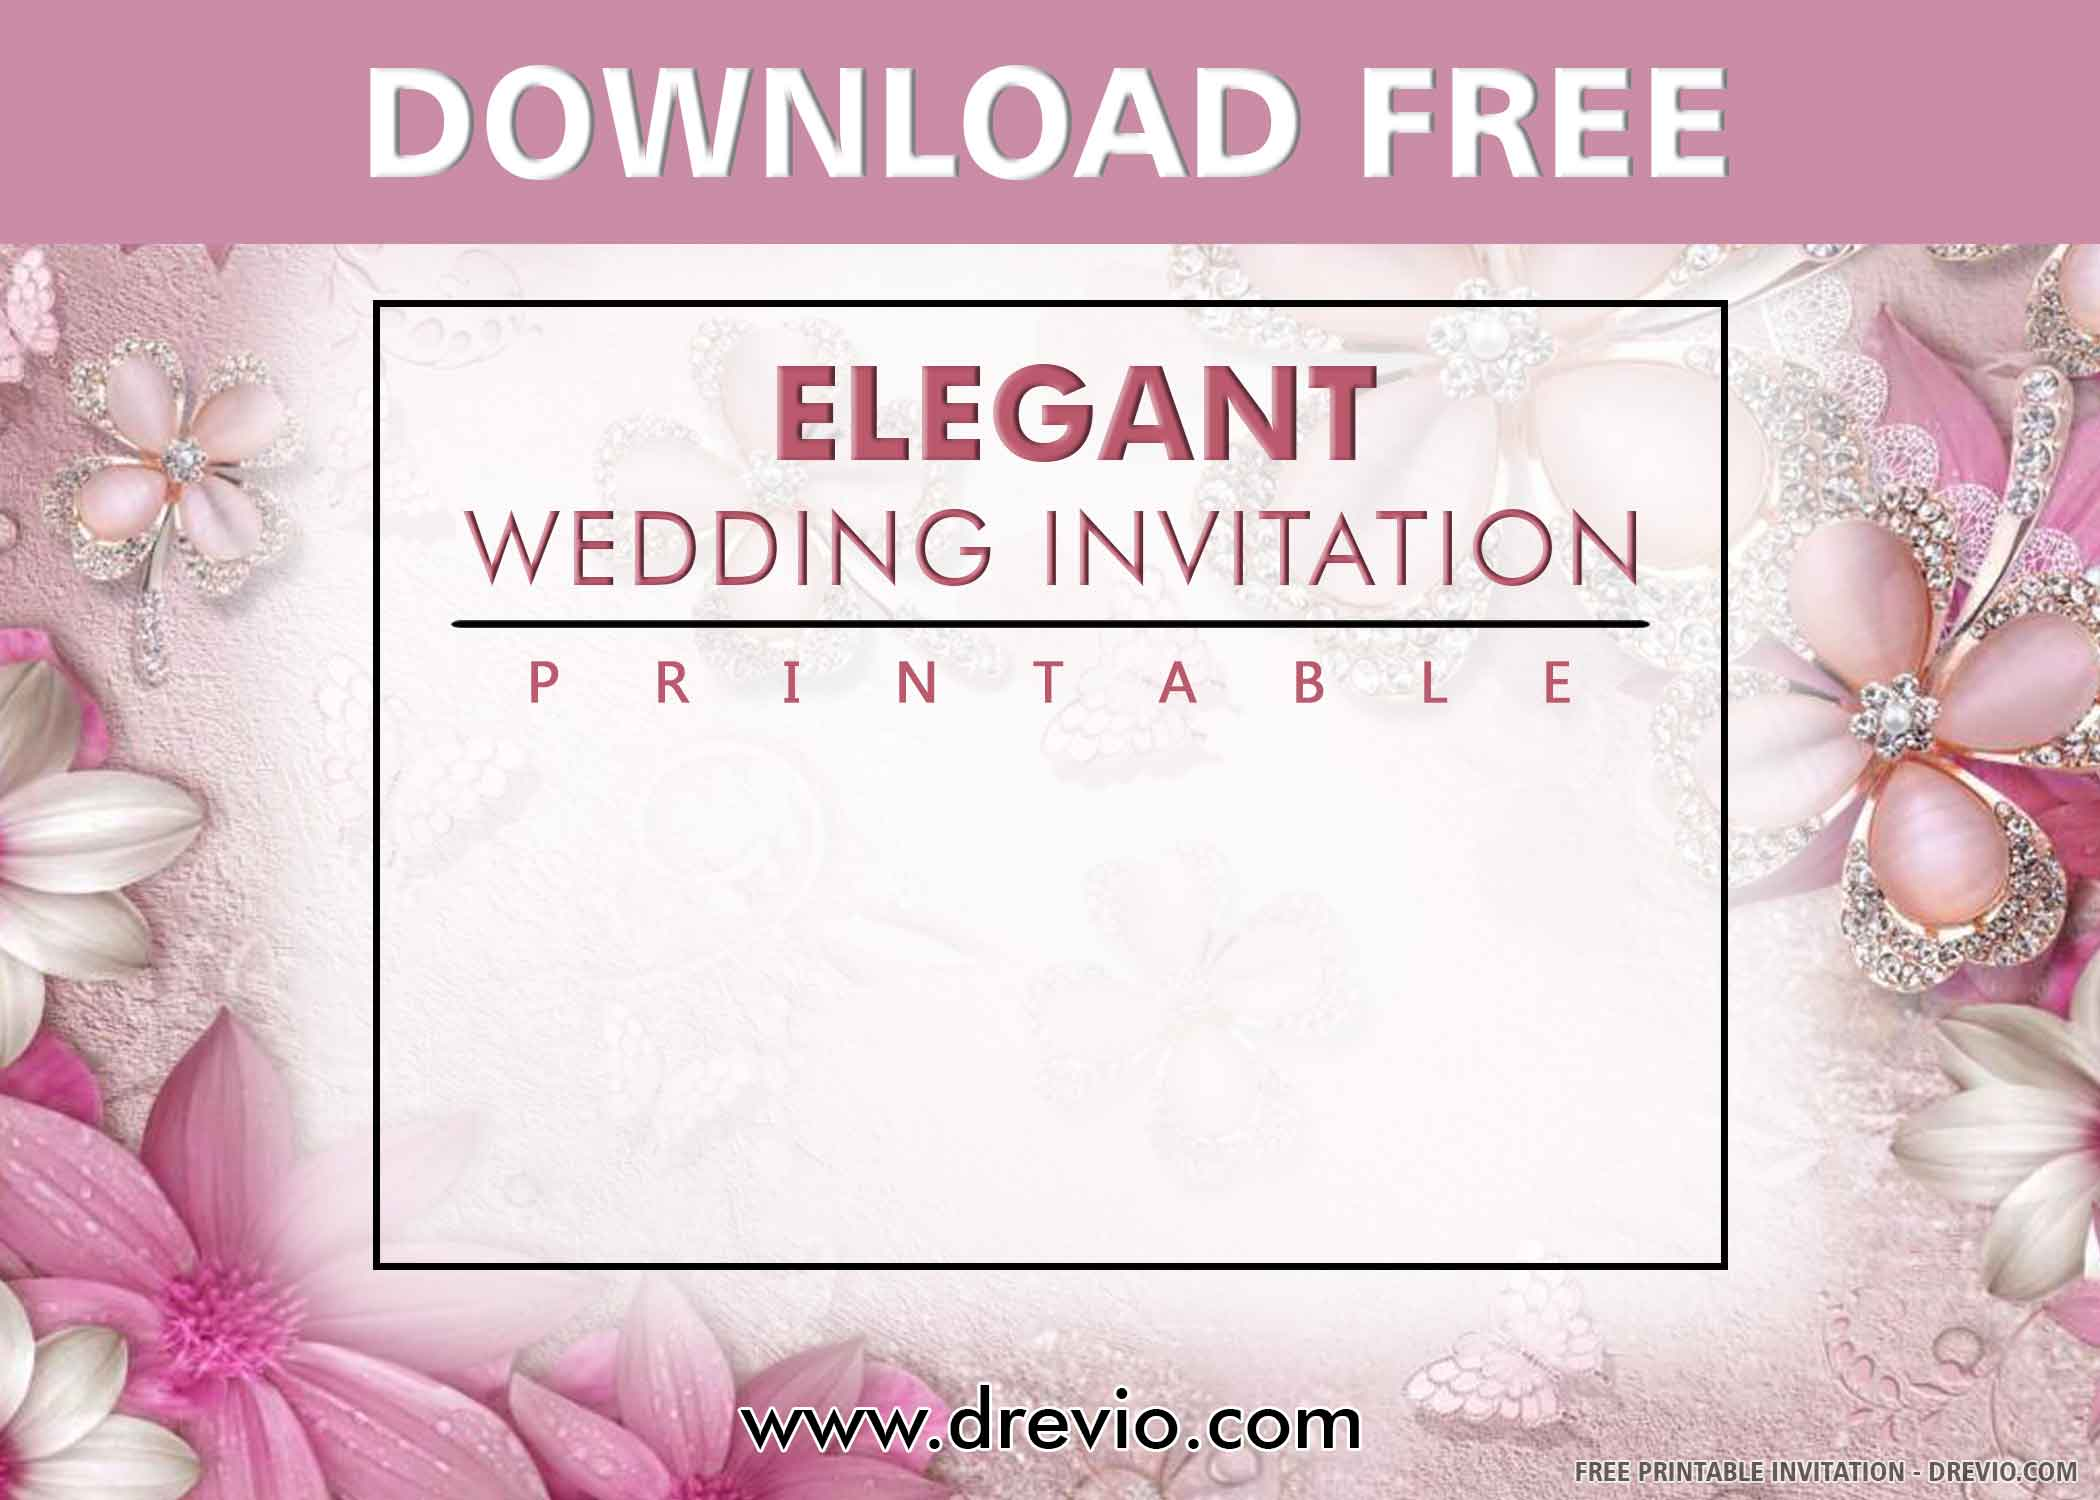 006 Stunning Printable Wedding Invitation Template Example  Free For Microsoft Word VintageFull